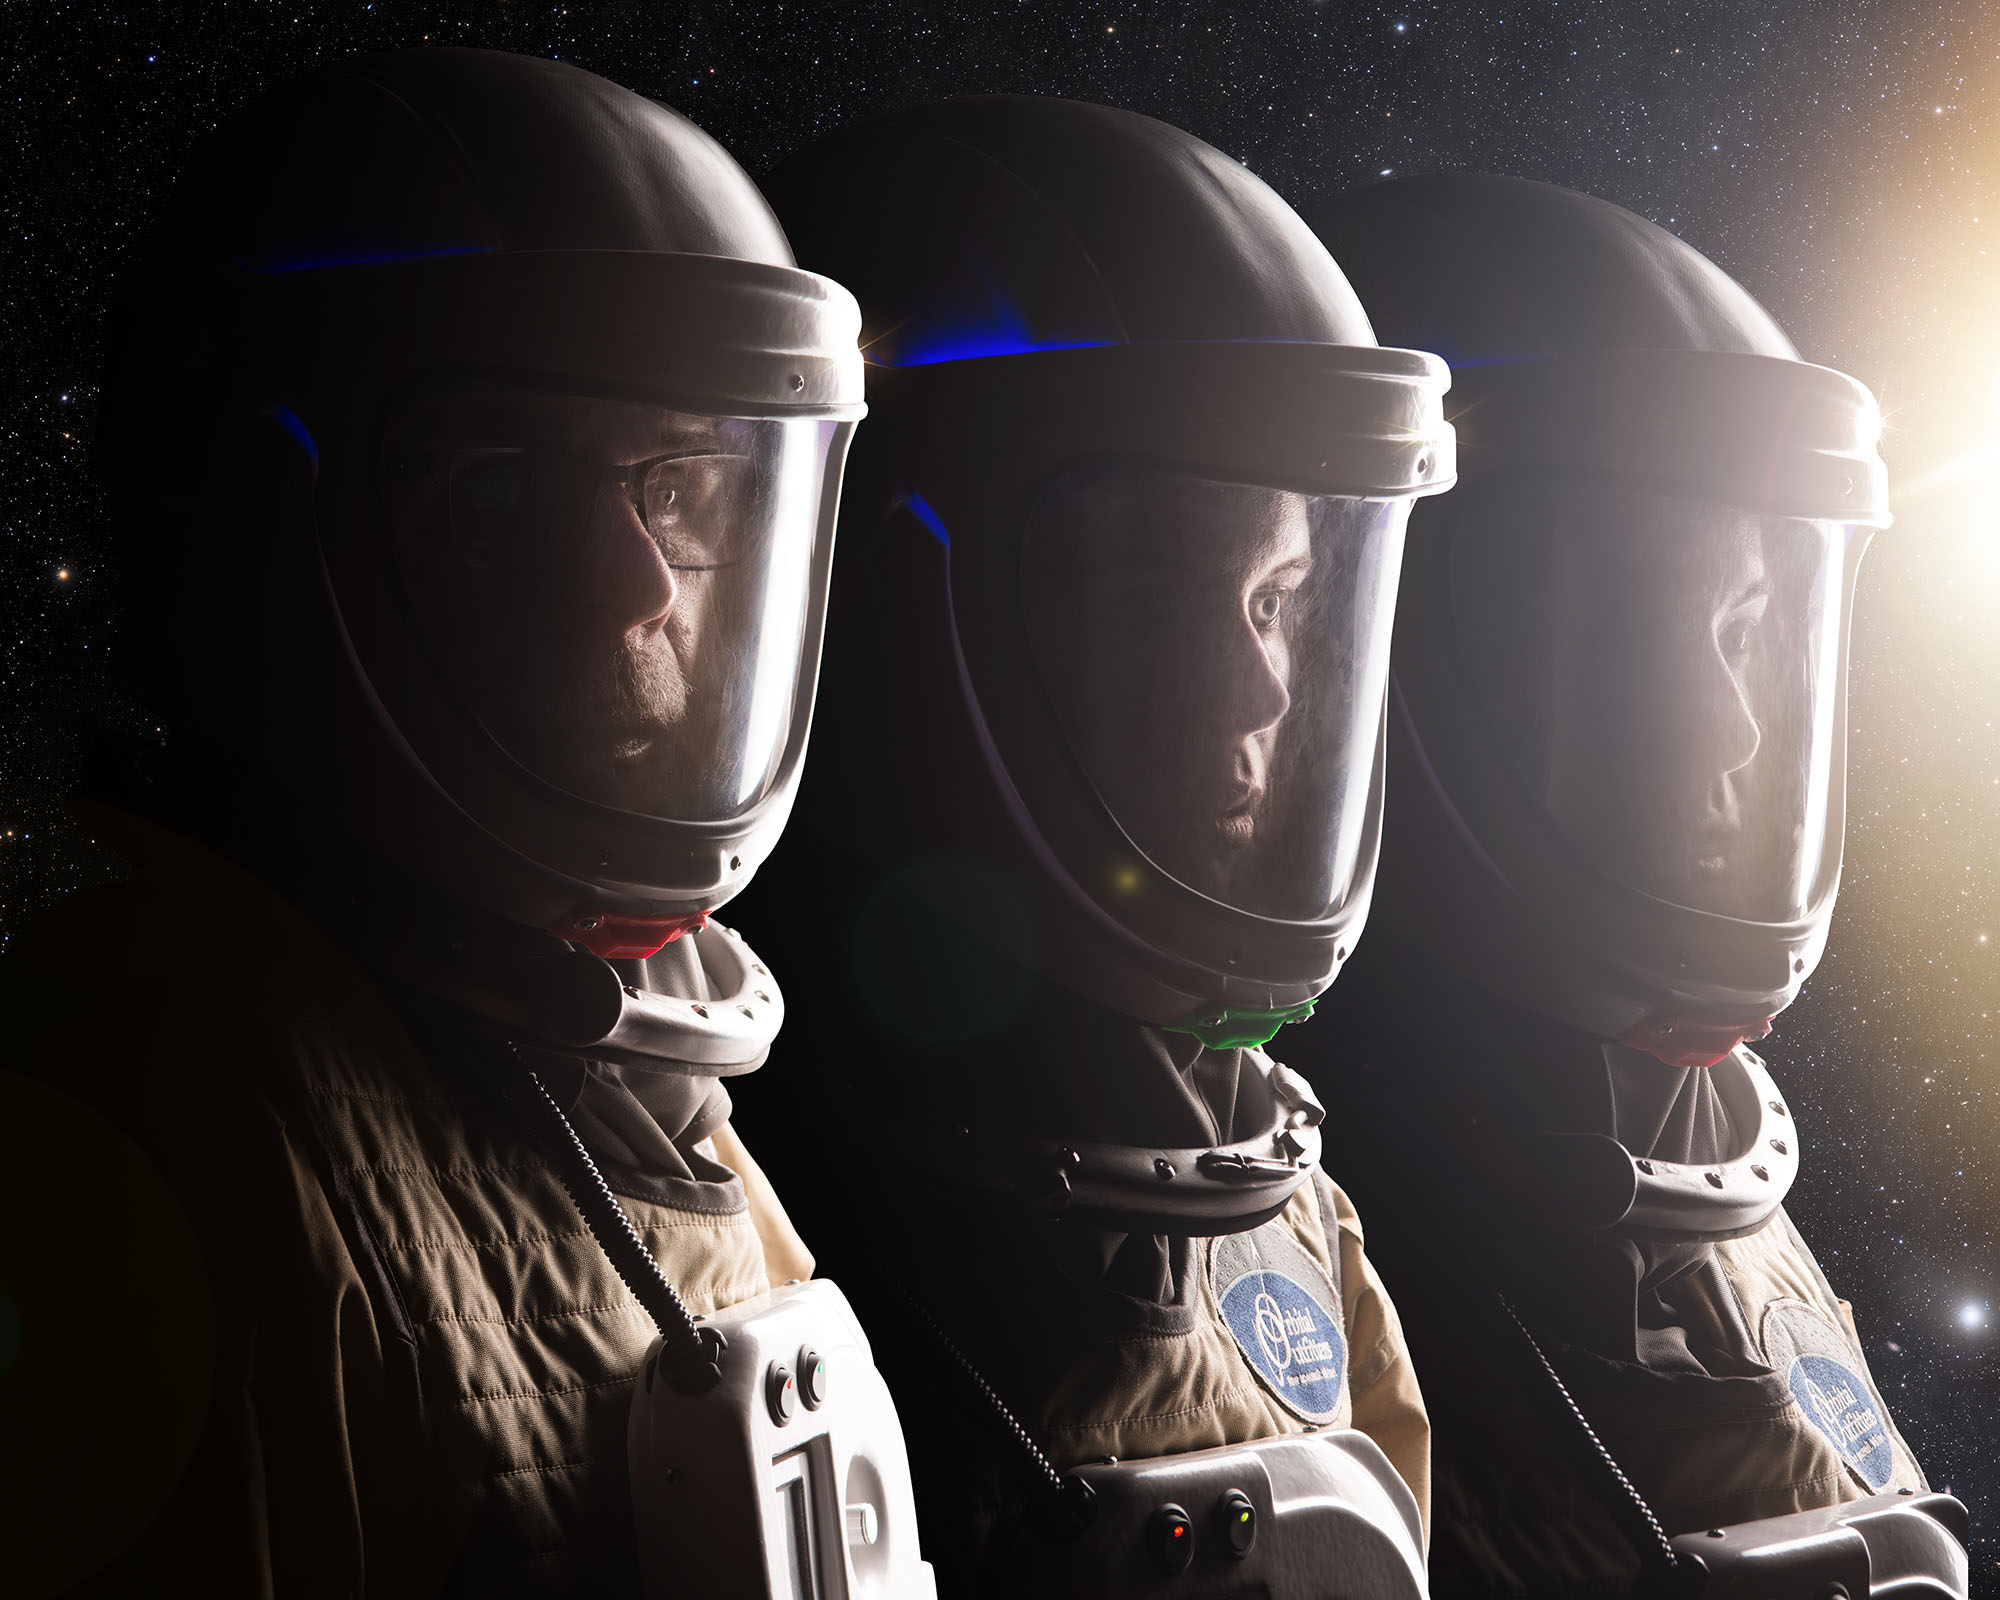 Astronauts_All_1_WEB.jpg